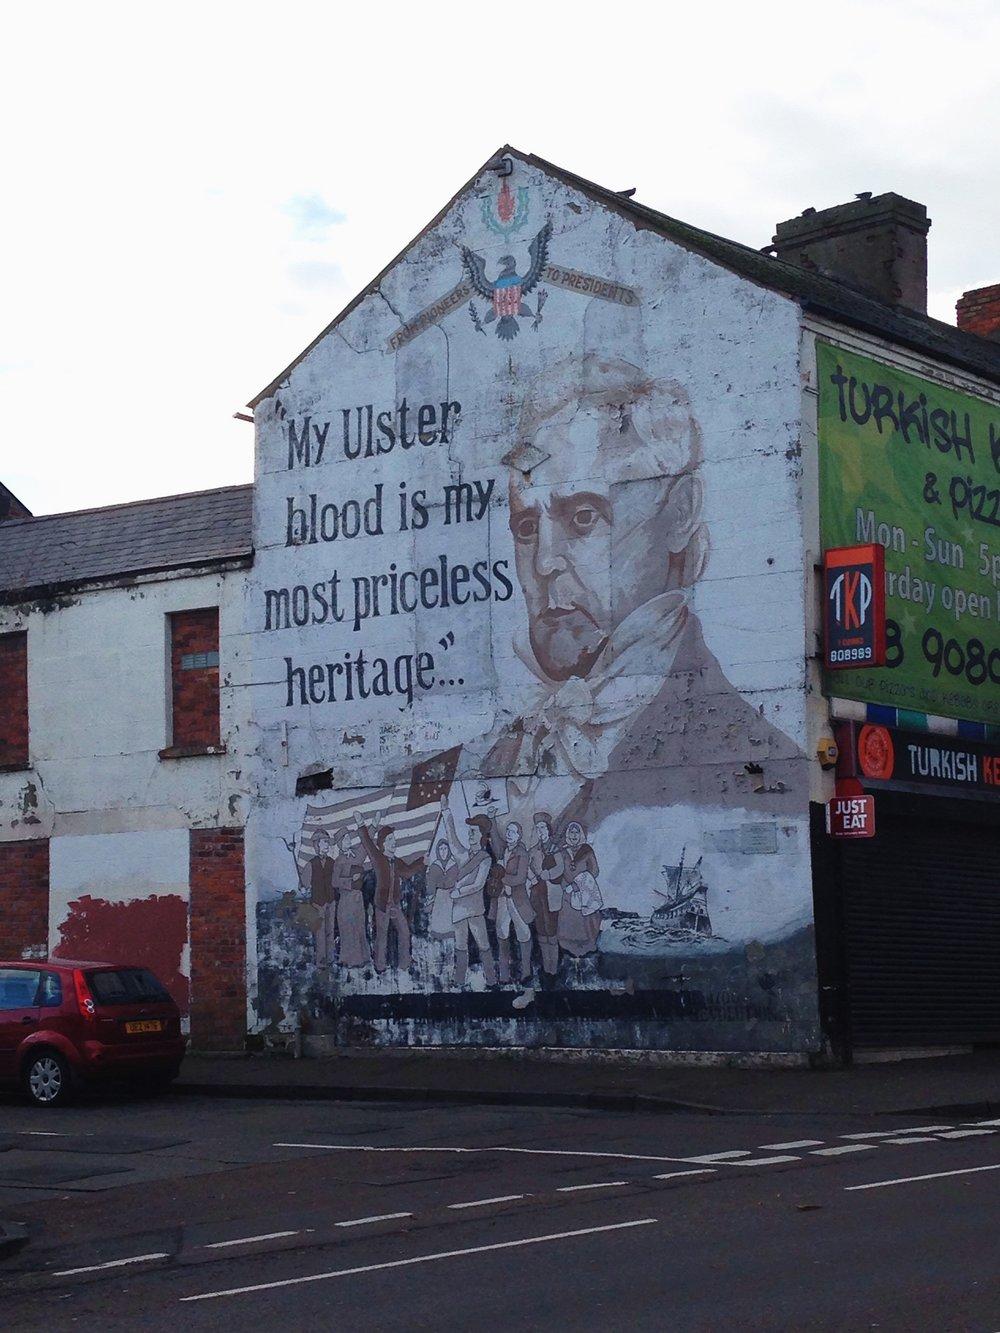 Pro-Unionist mural seen in Belfast, Ireland. © E.A. Crunden